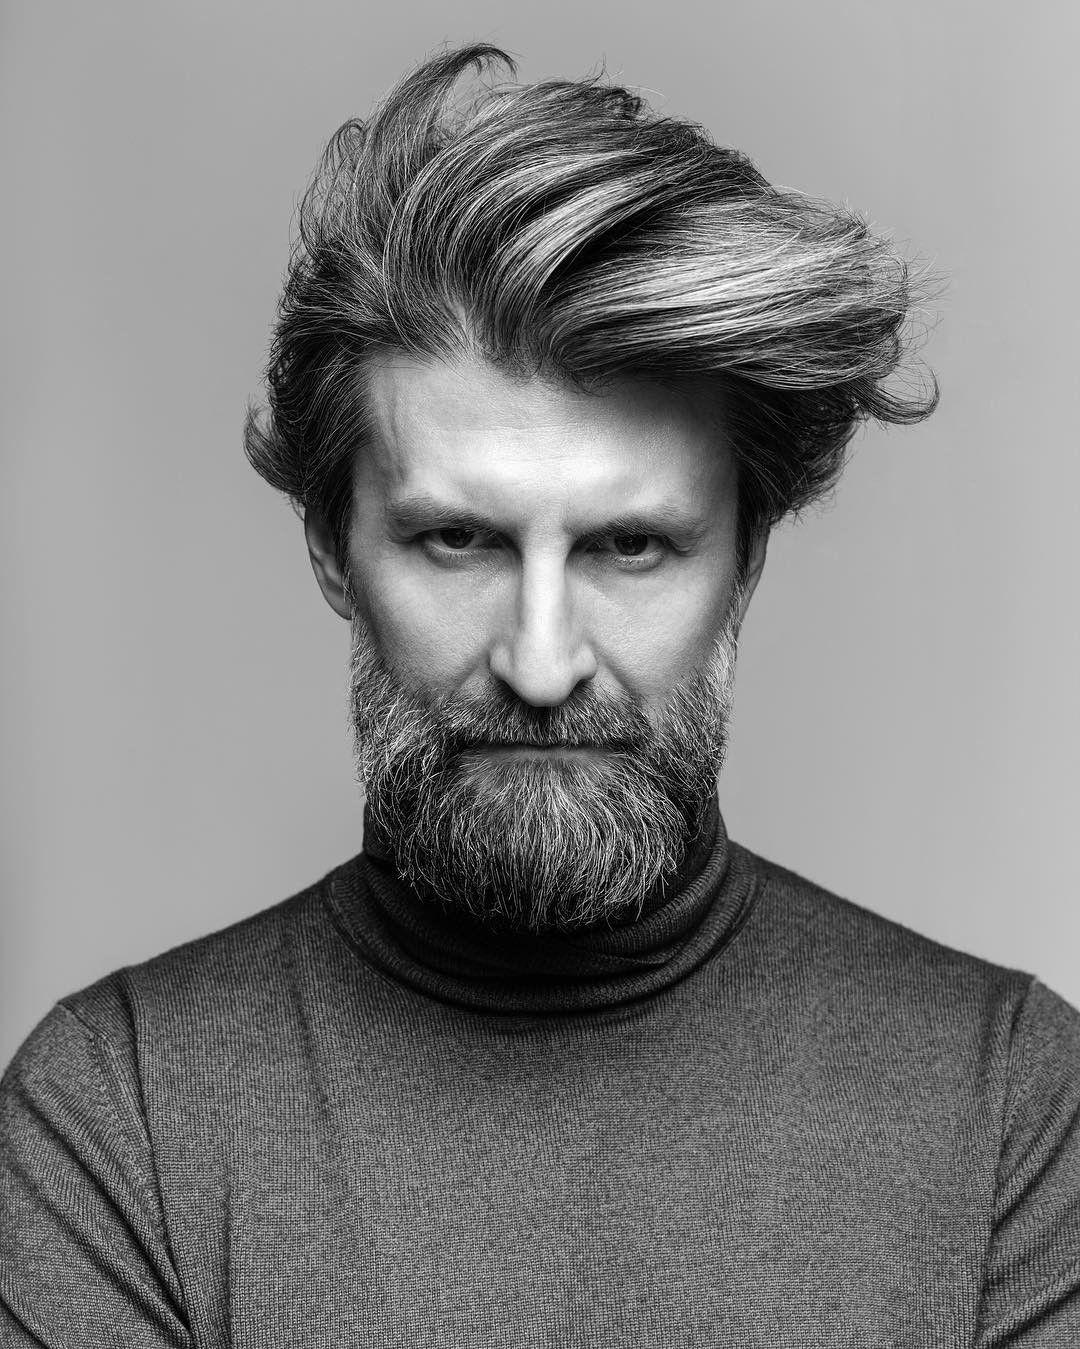 Haircut for men hairline  отметок Нравится  комментариев u Ибадов Рустам rusbarber